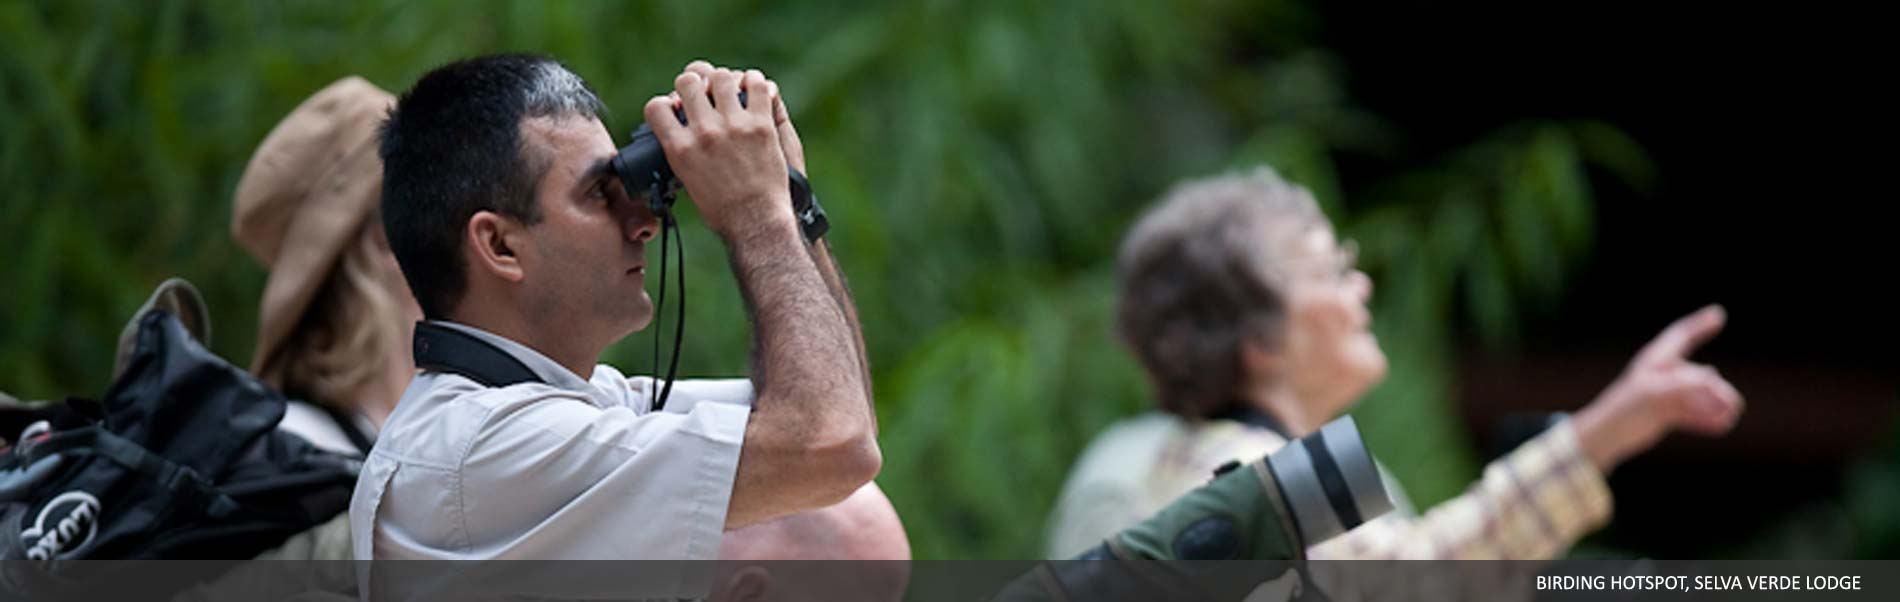 selvaverde-costarica-24.jpg